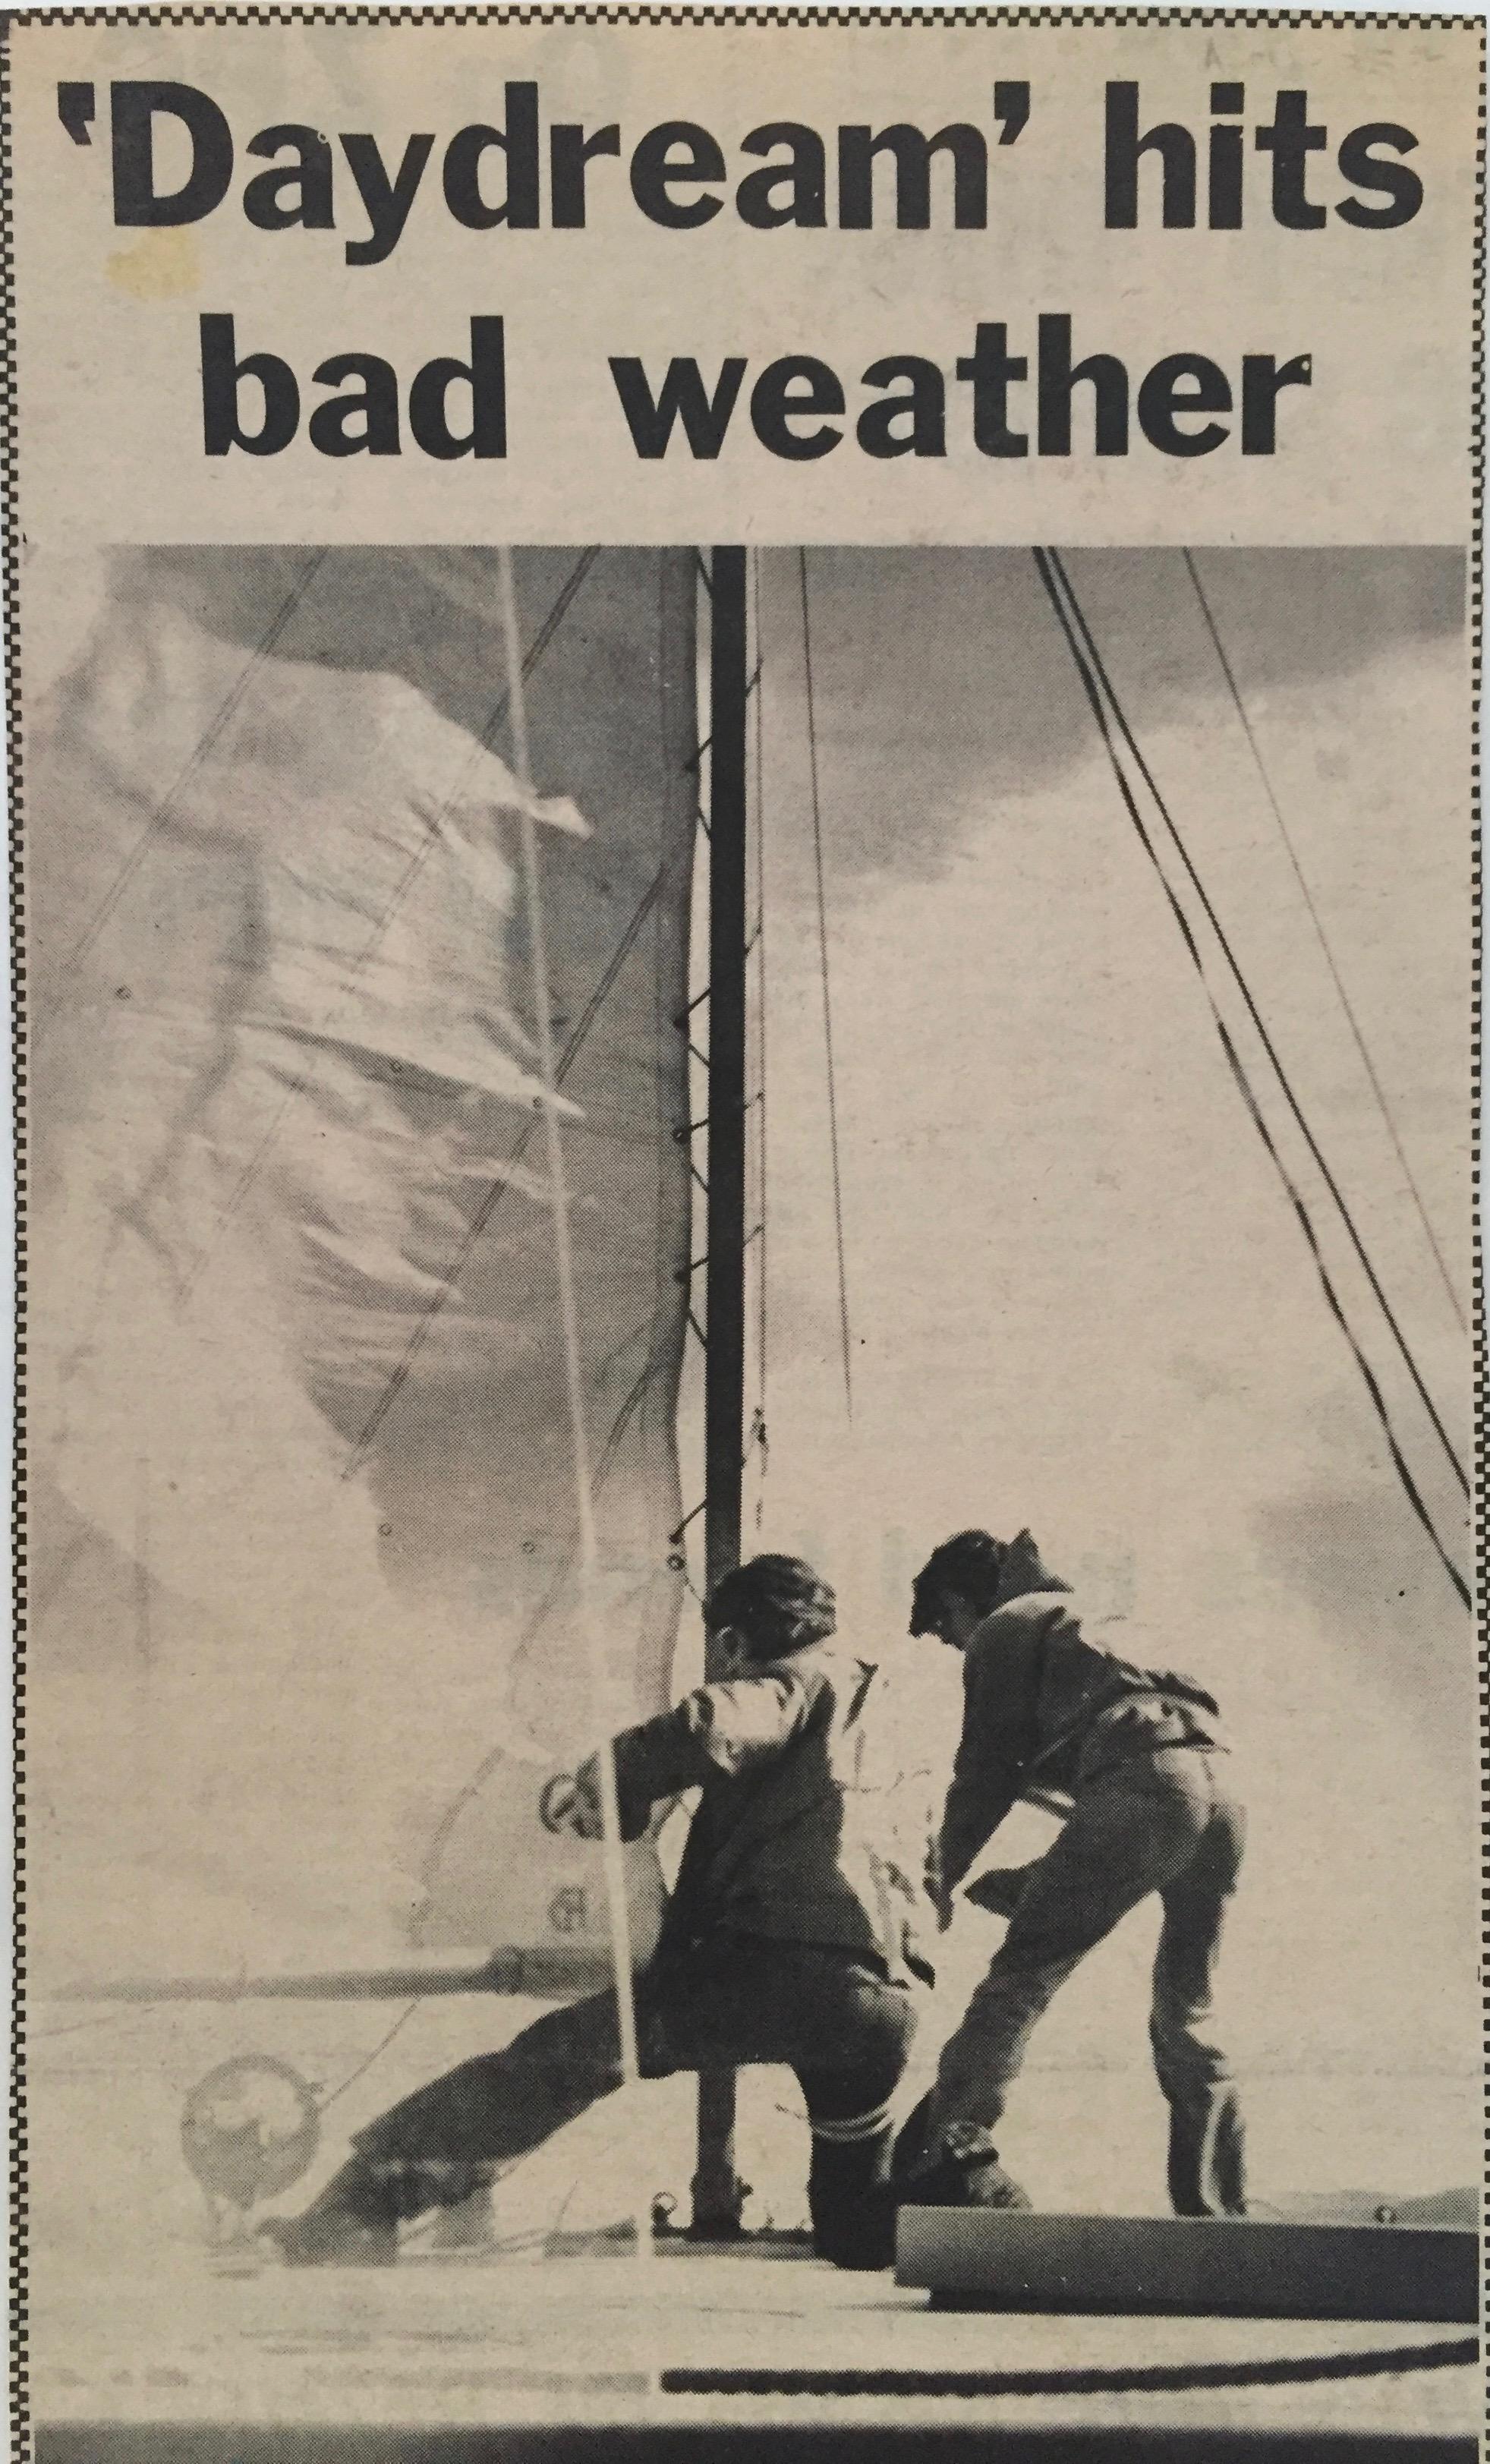 Sailing Daydream up the East Coast of Australia